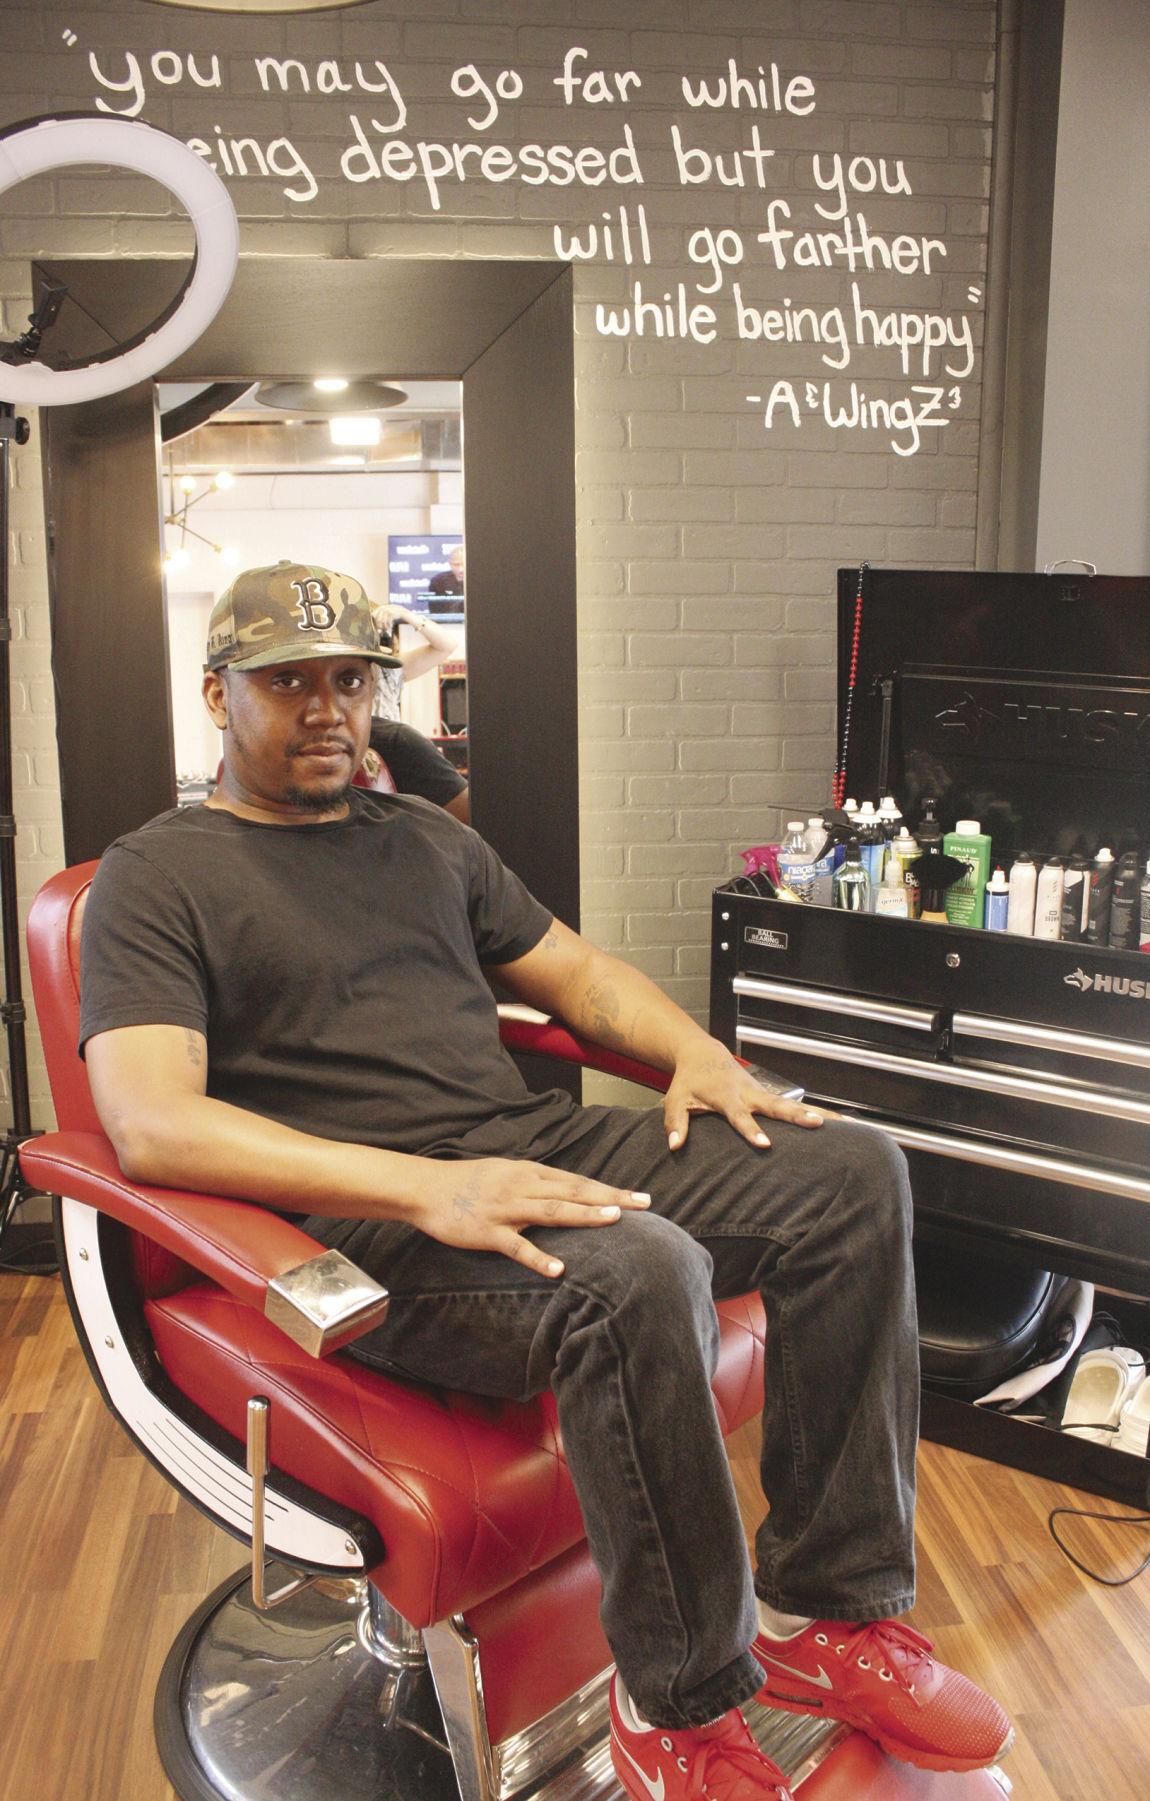 B. Right Barbershop focuses on community